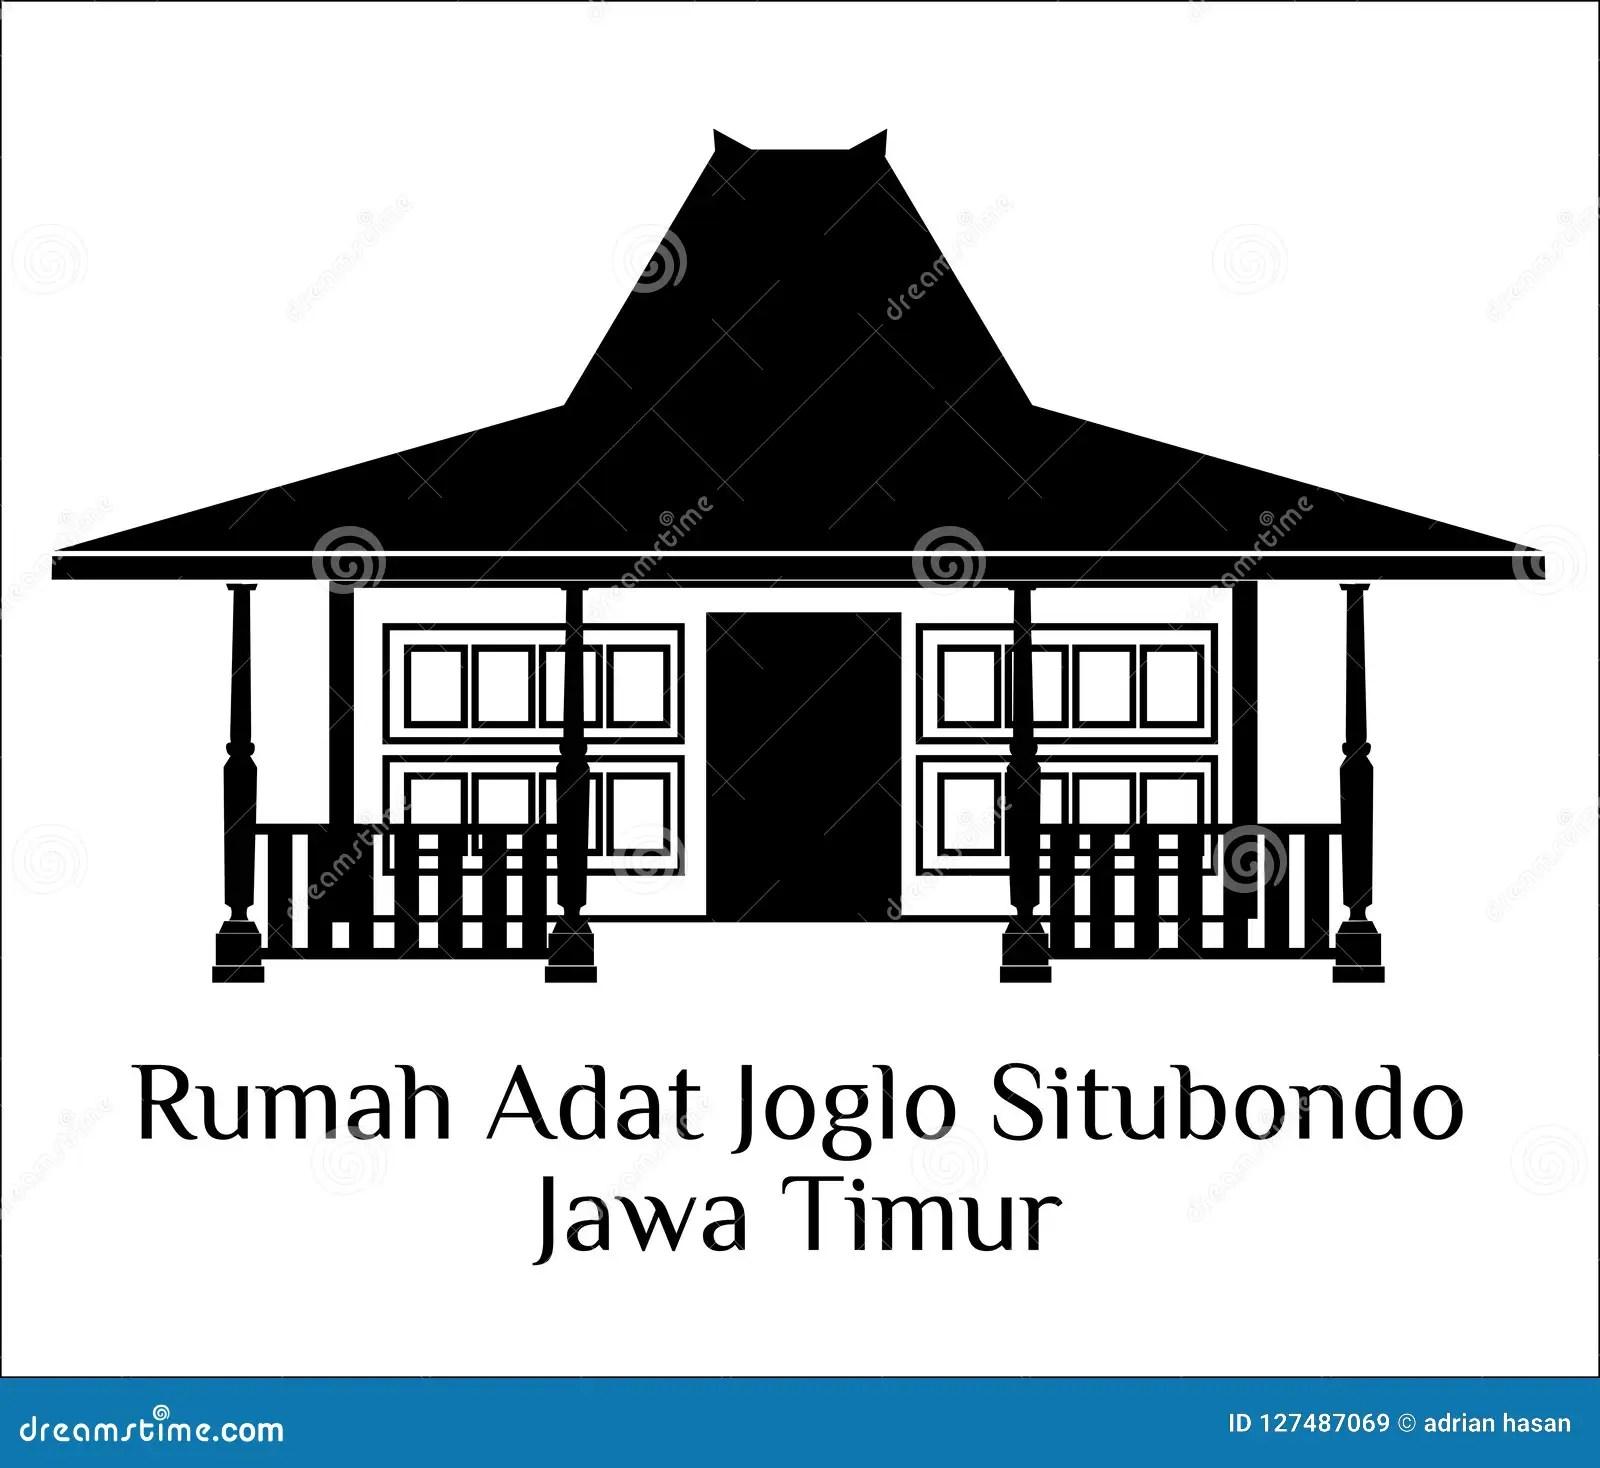 Rumah Adat Joglo Situbondo Jawa Timur Stock Illustration